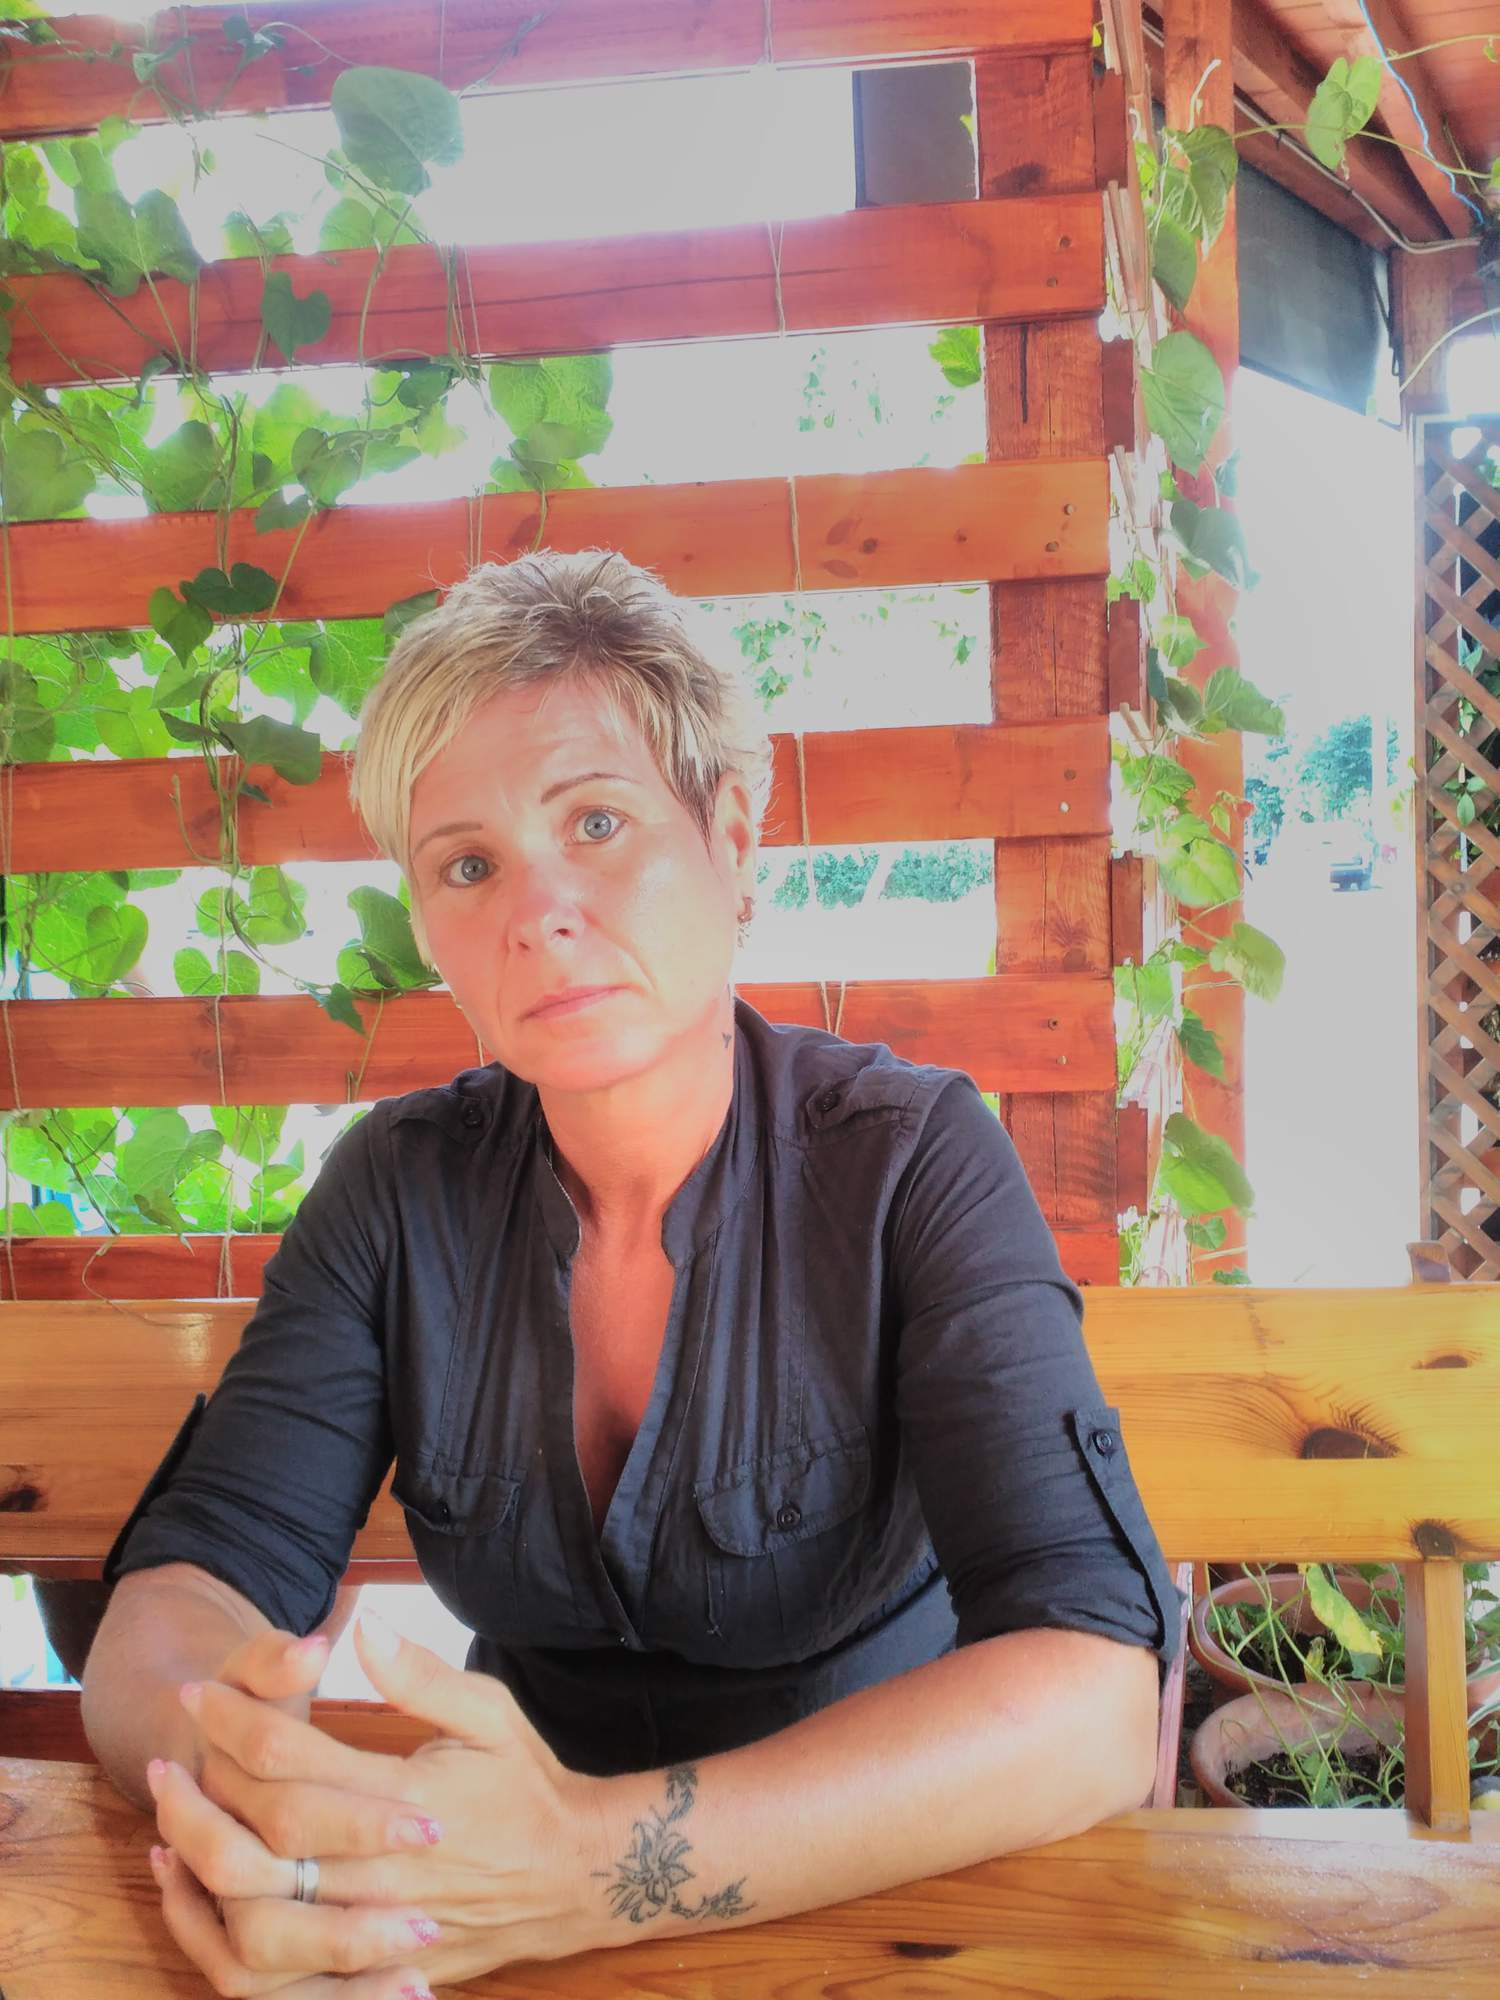 http://img25.rajce.idnes.cz/d2502/14/14660/14660196_9f28440ac985ba1fcc32e6bdf80e4ecf/images/foto_telefon_m_332.jpg